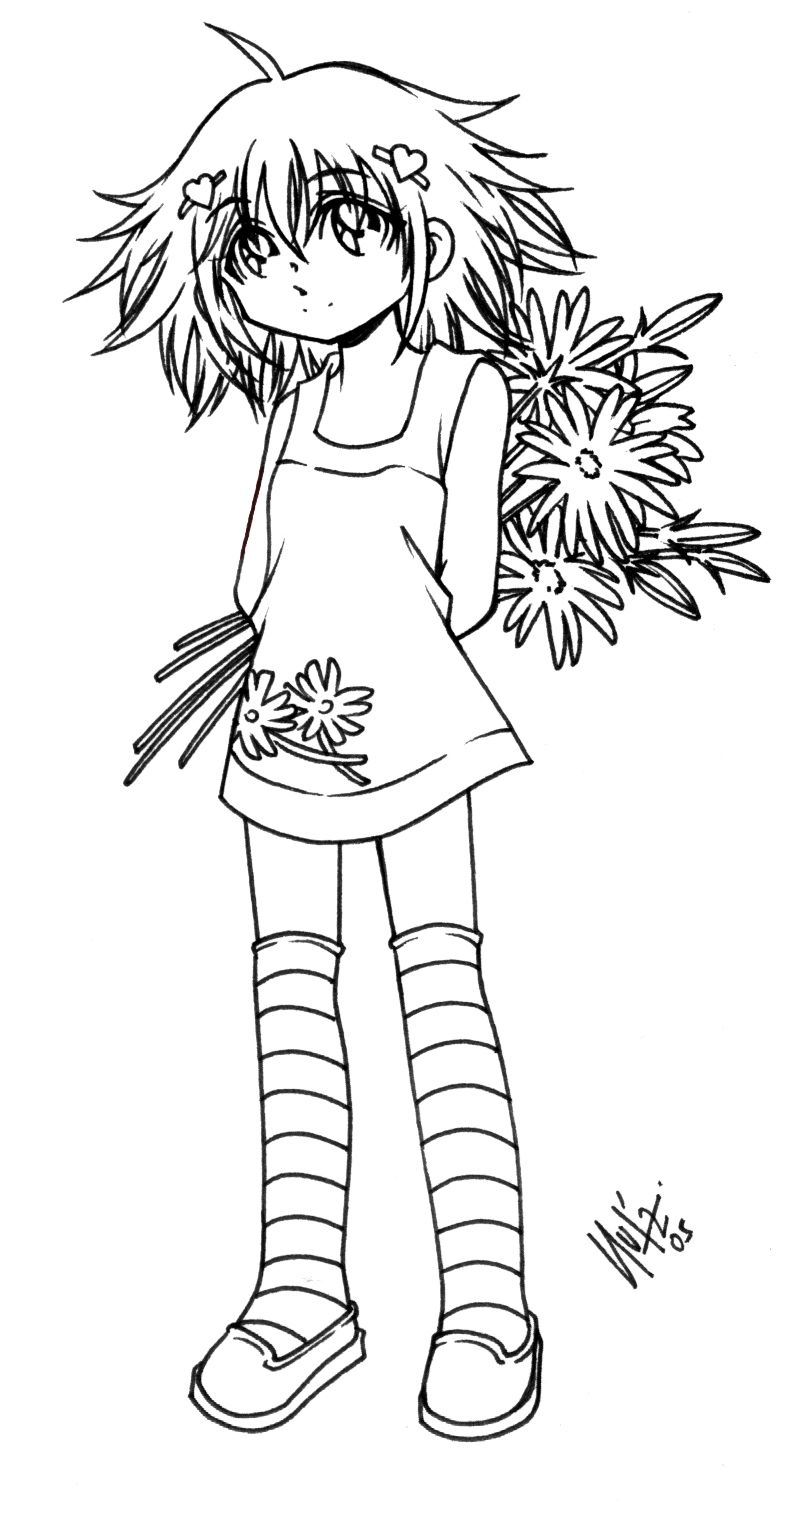 a lil tiny drawing 05... by sureya.deviantart.com on @DeviantArt